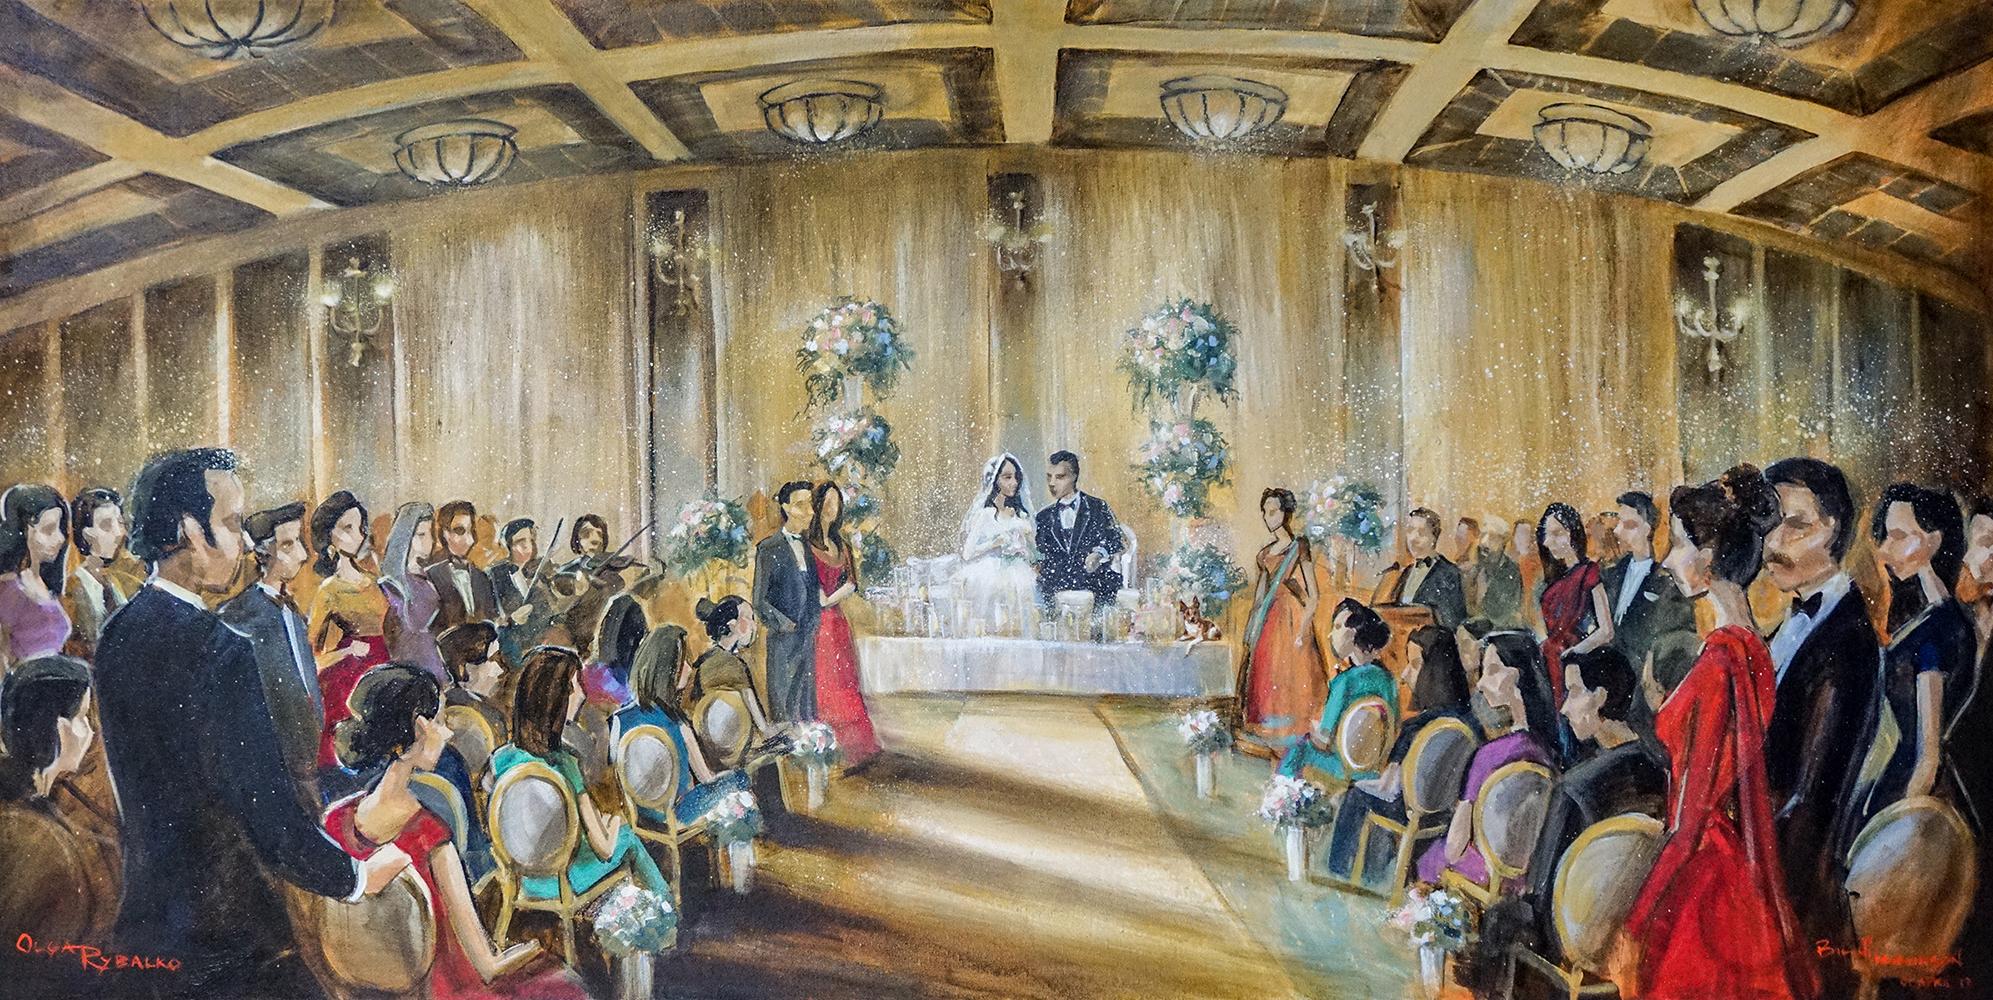 impressions+live+art+wedding+painting+newlands+vancouver+wedding+entertainment